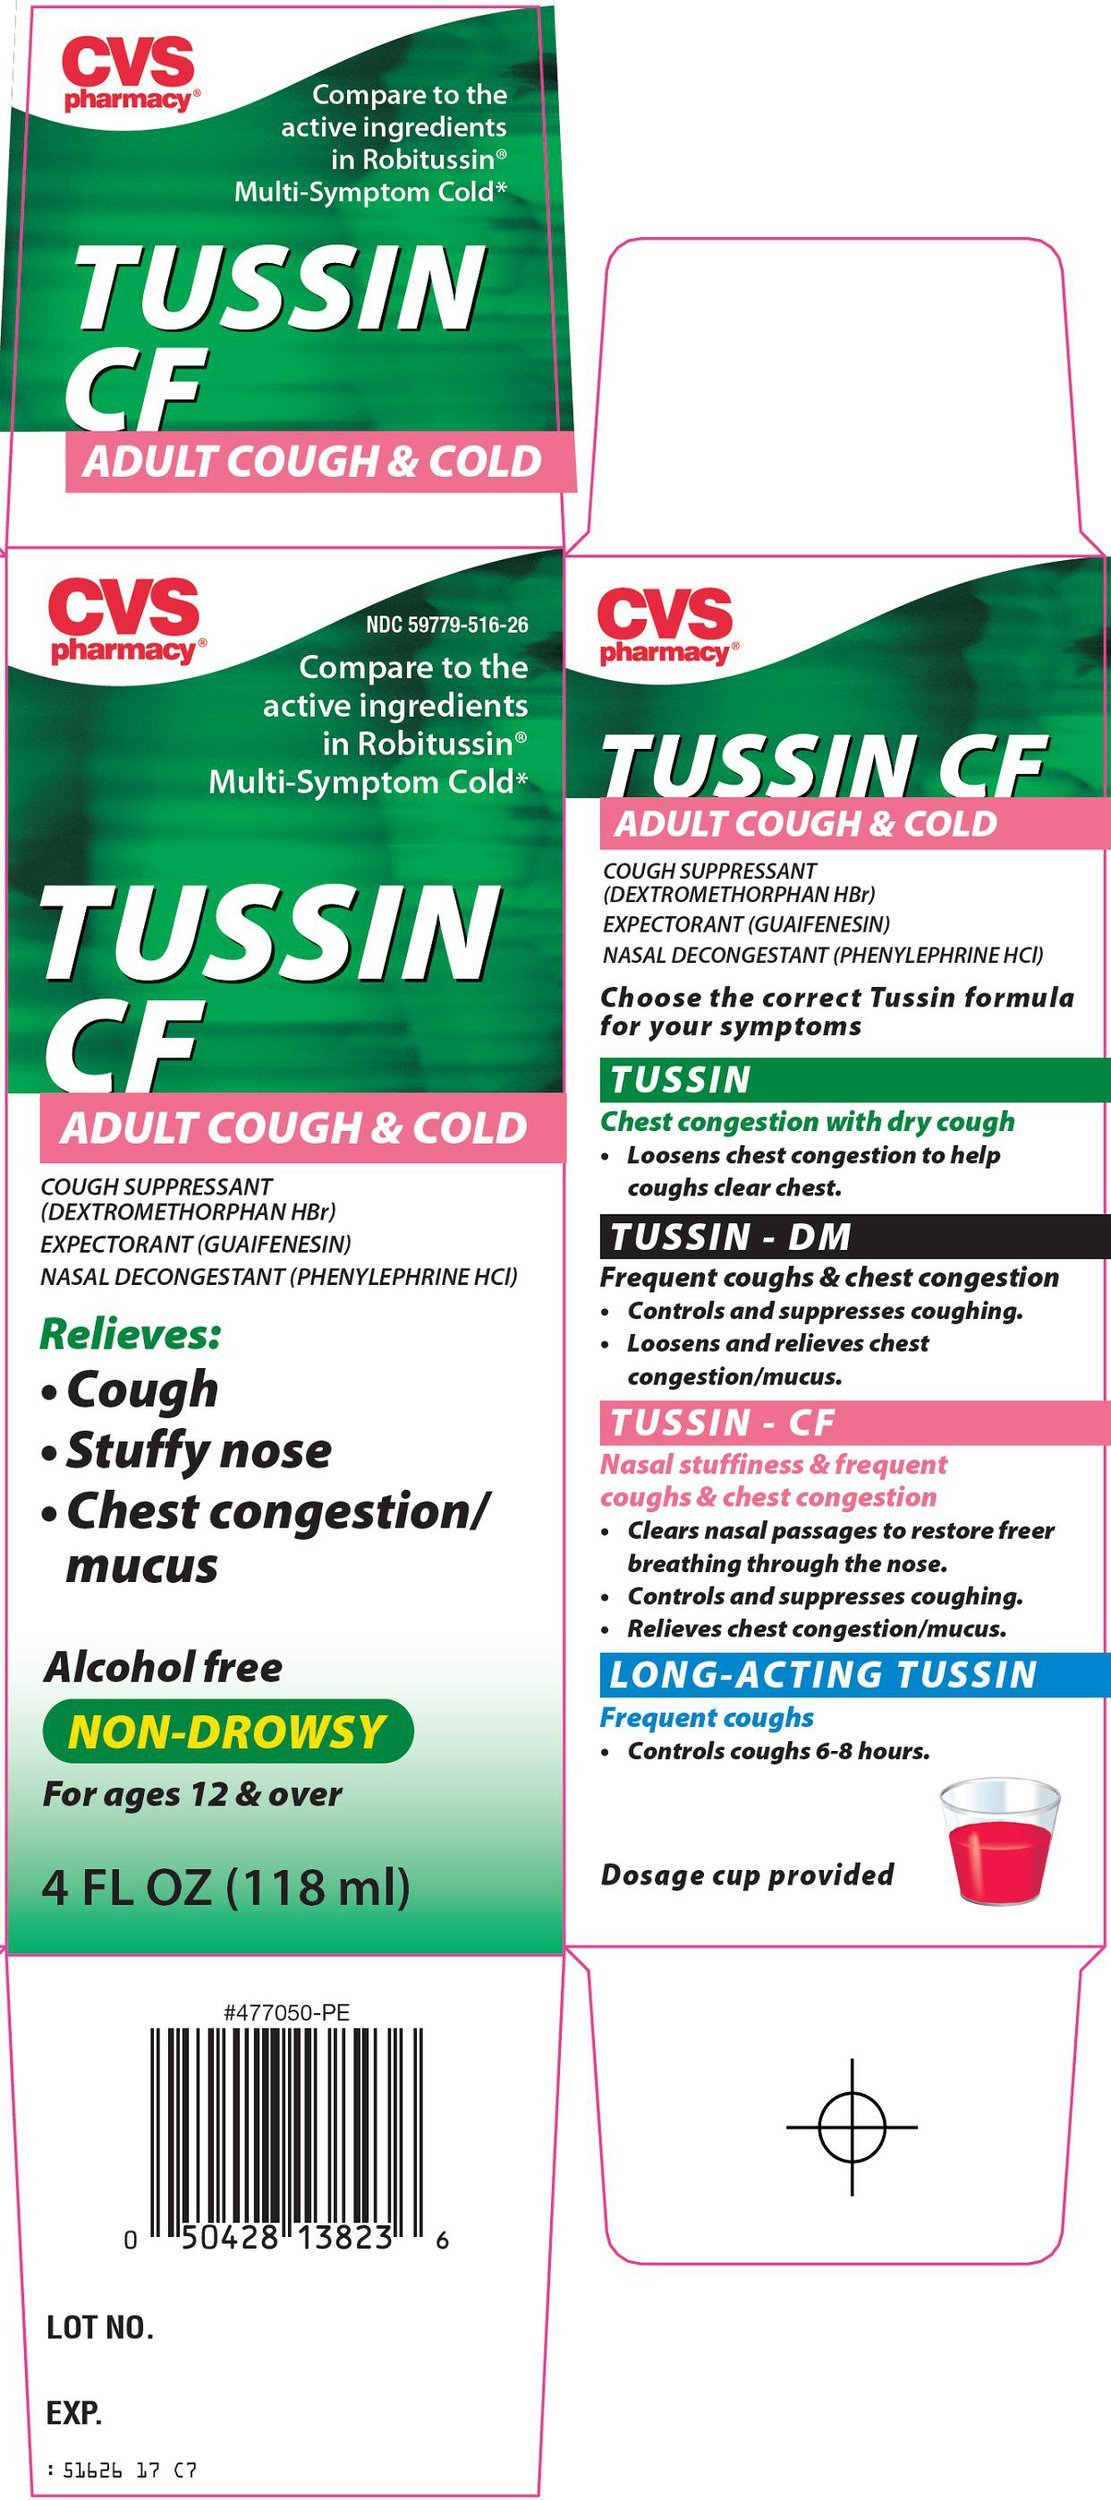 Phenylephrine and Guaifenesin Liquid - Pictures